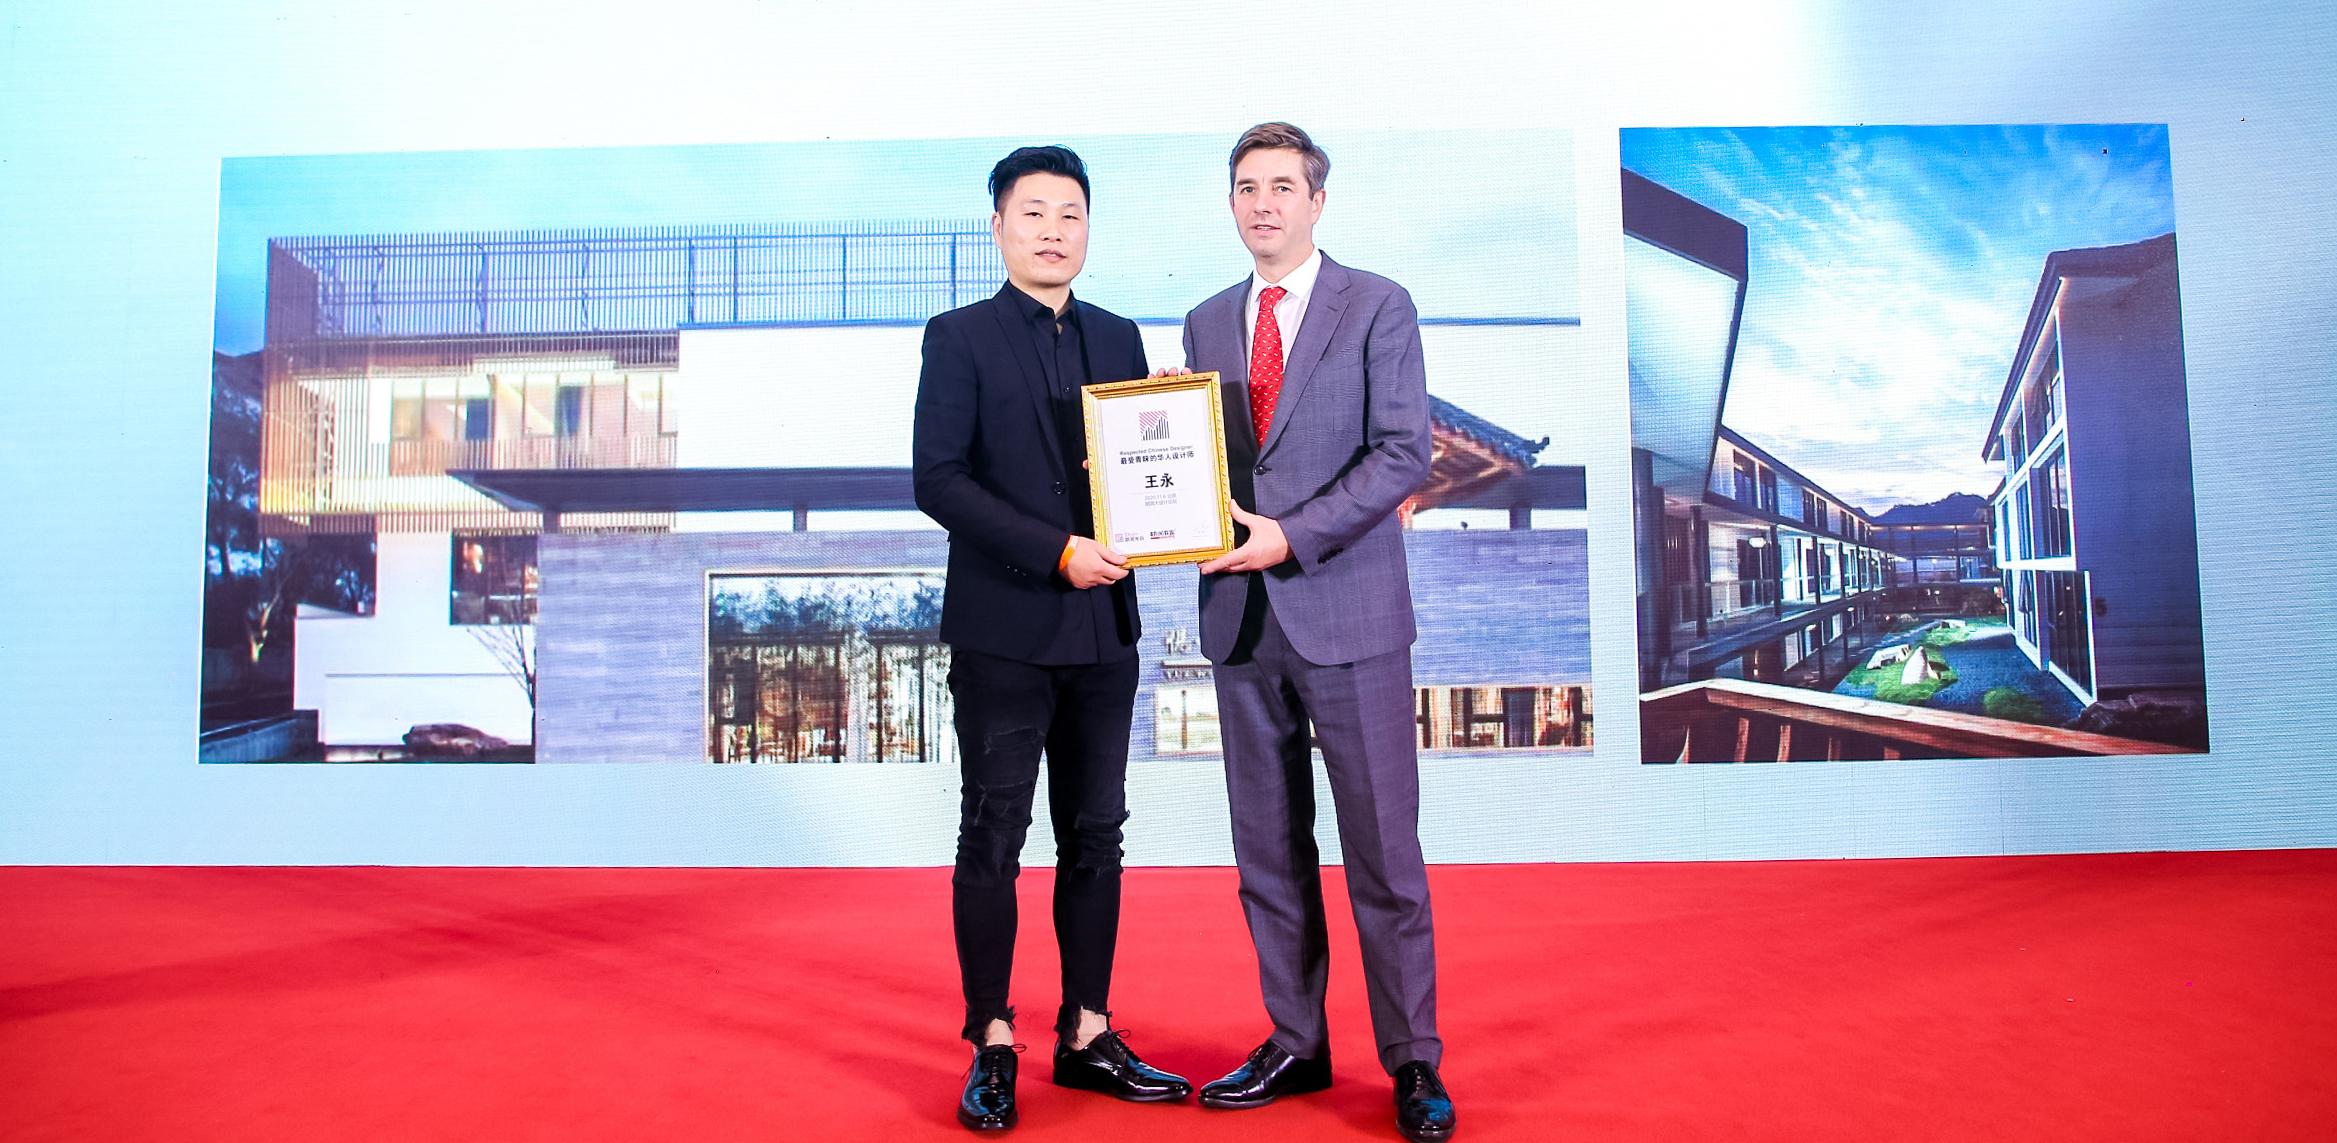 WUUX無象空间:王永先生荣获胡润最受青睐的华人设计师